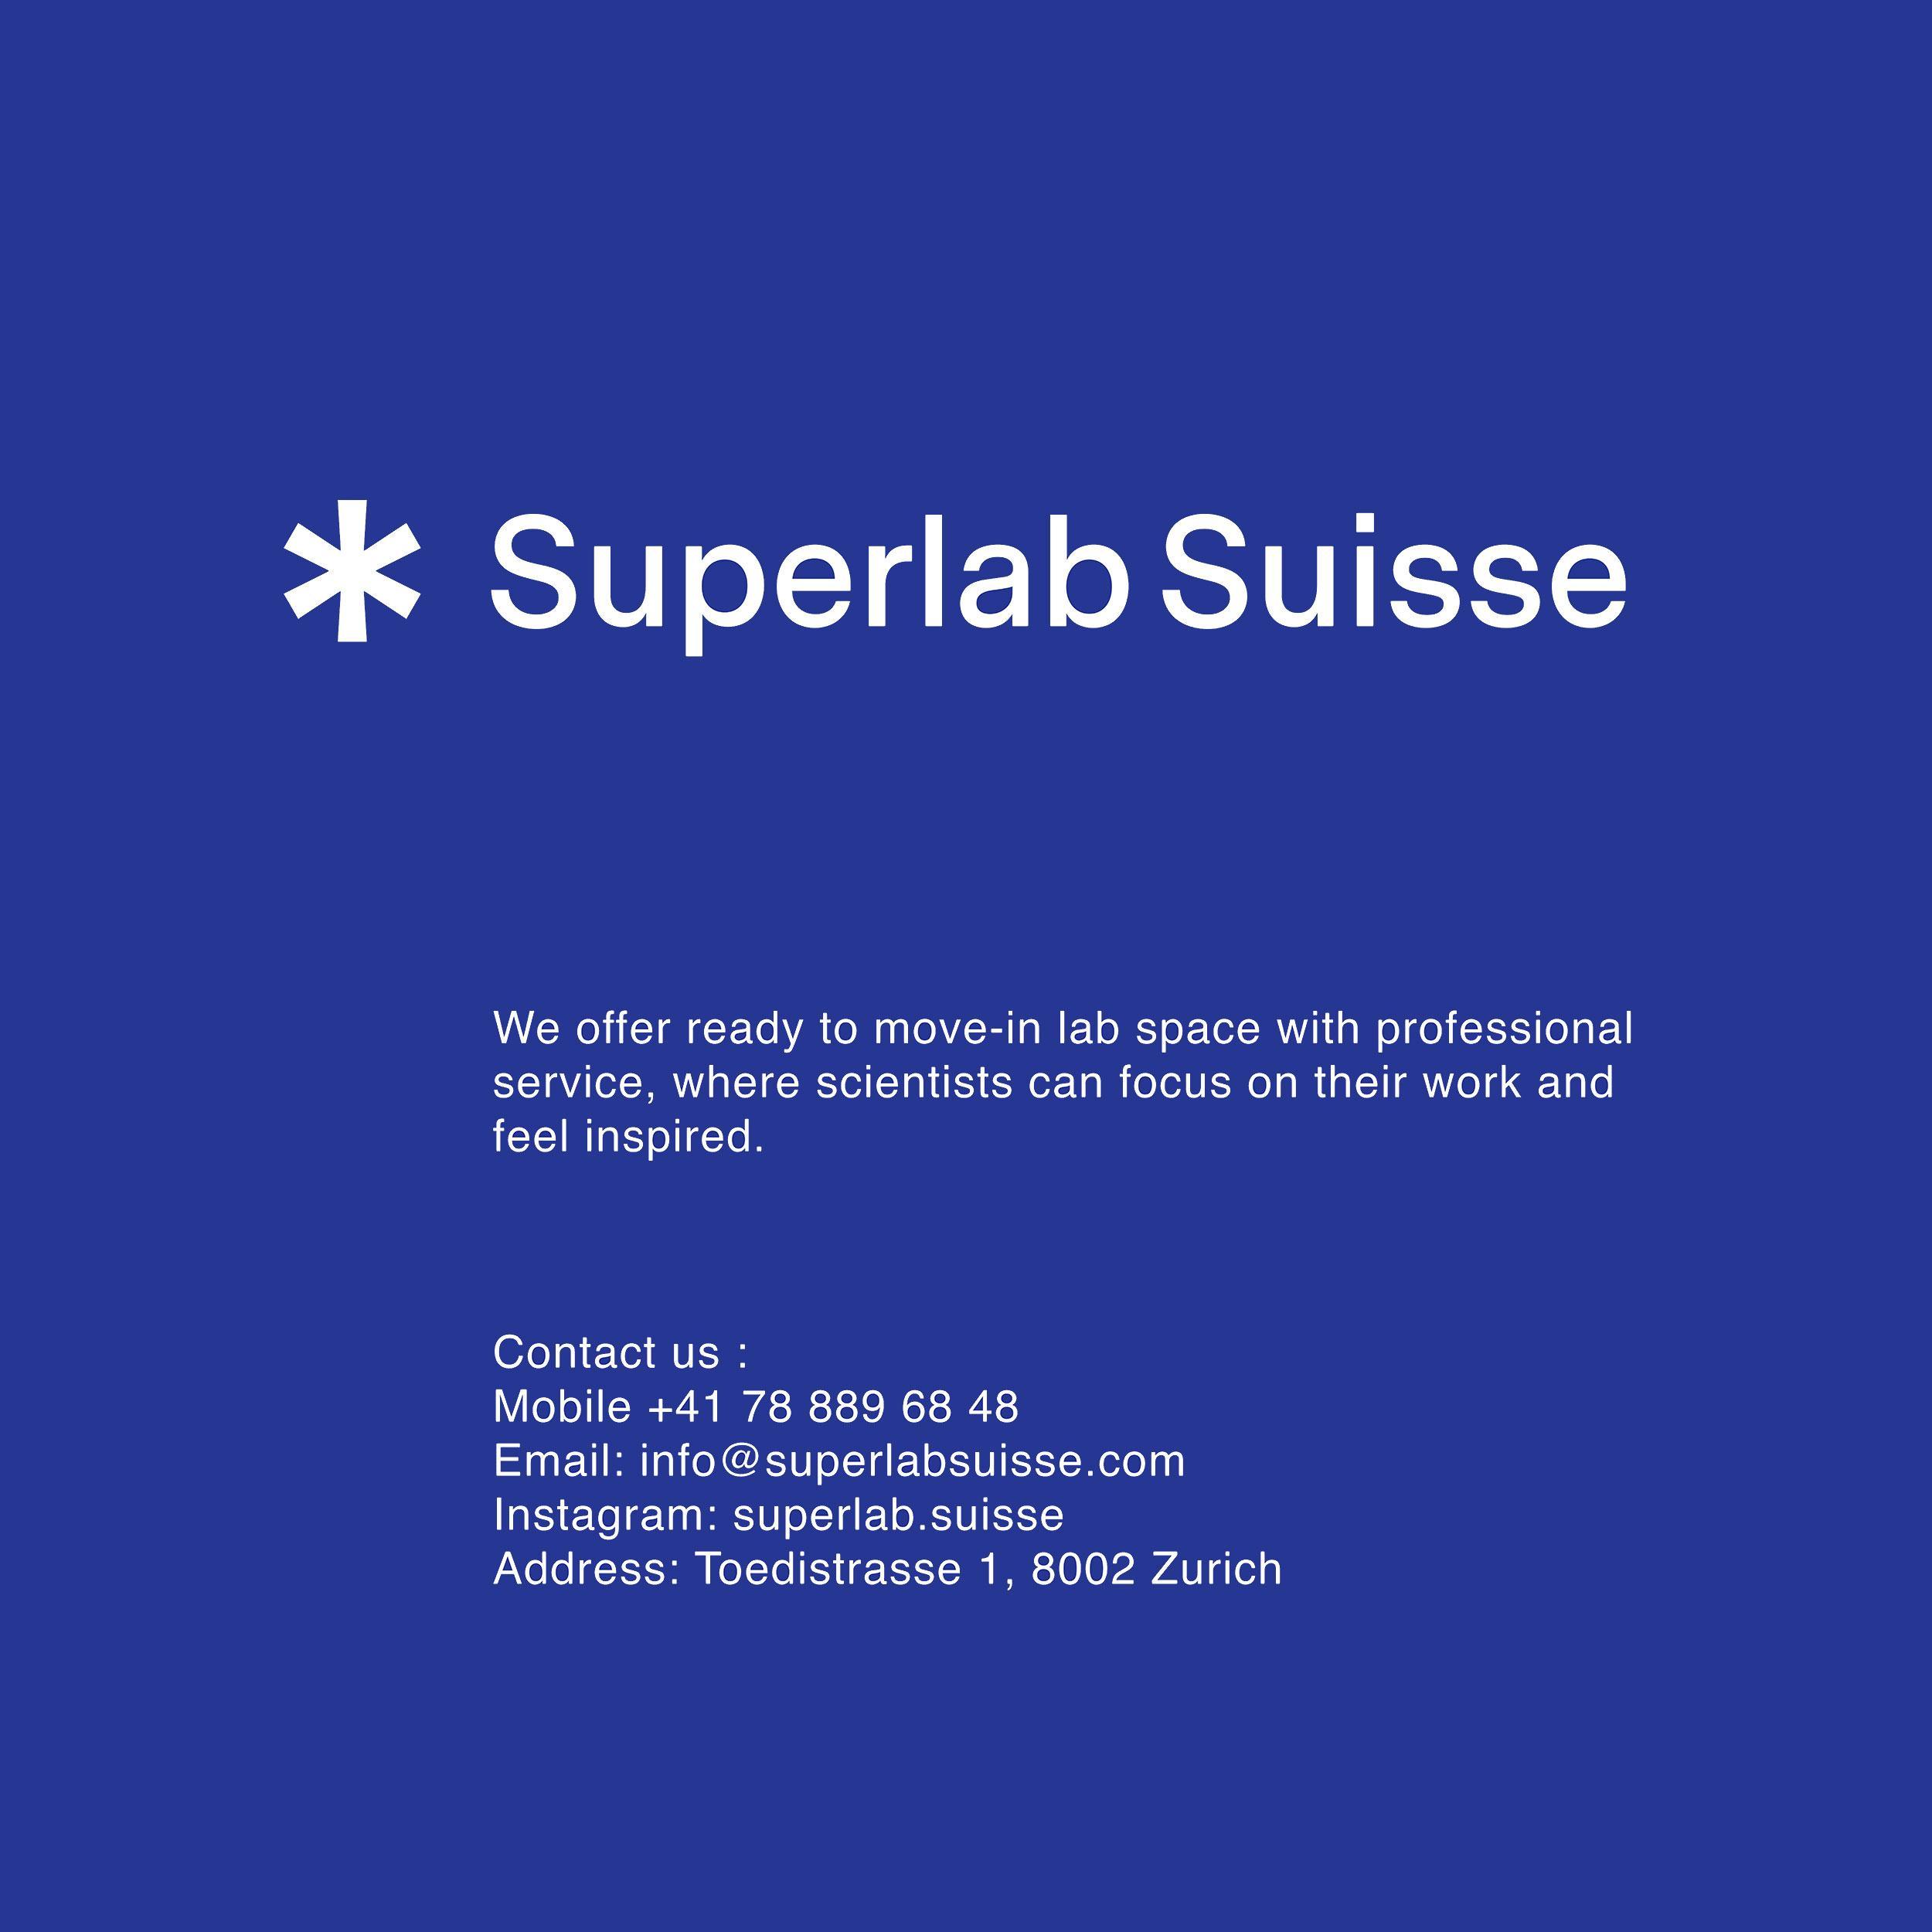 superlabsuisse image